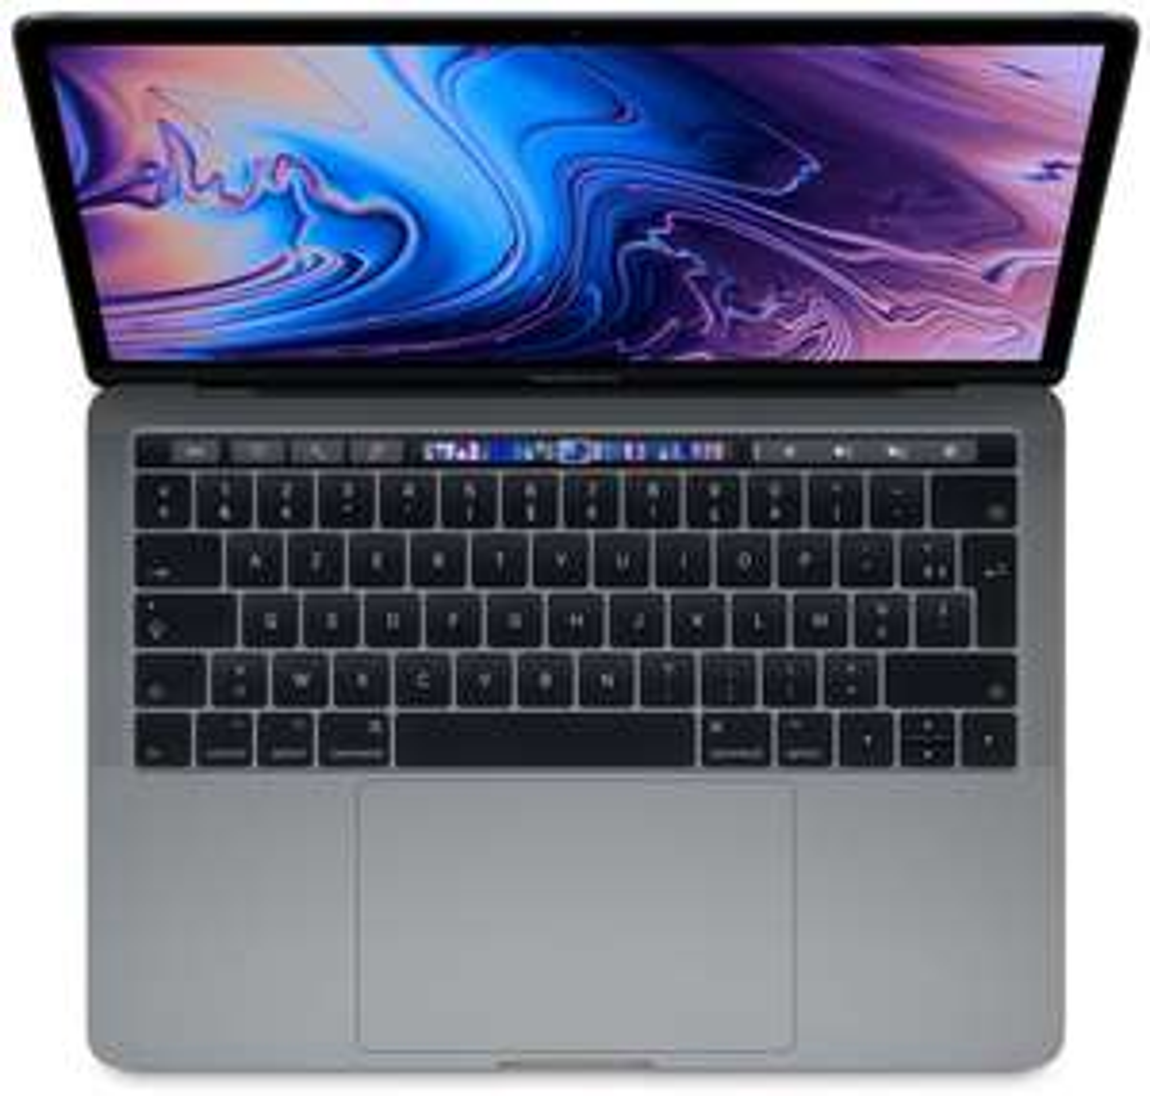 "PC portable 15.4"" Apple MacBook Pro Touch Bar (2019) - WQXGA+, i9 (2.3 GHz), Radeon Pro 560X, 16 Go de RAM, 512 Go en SSD"